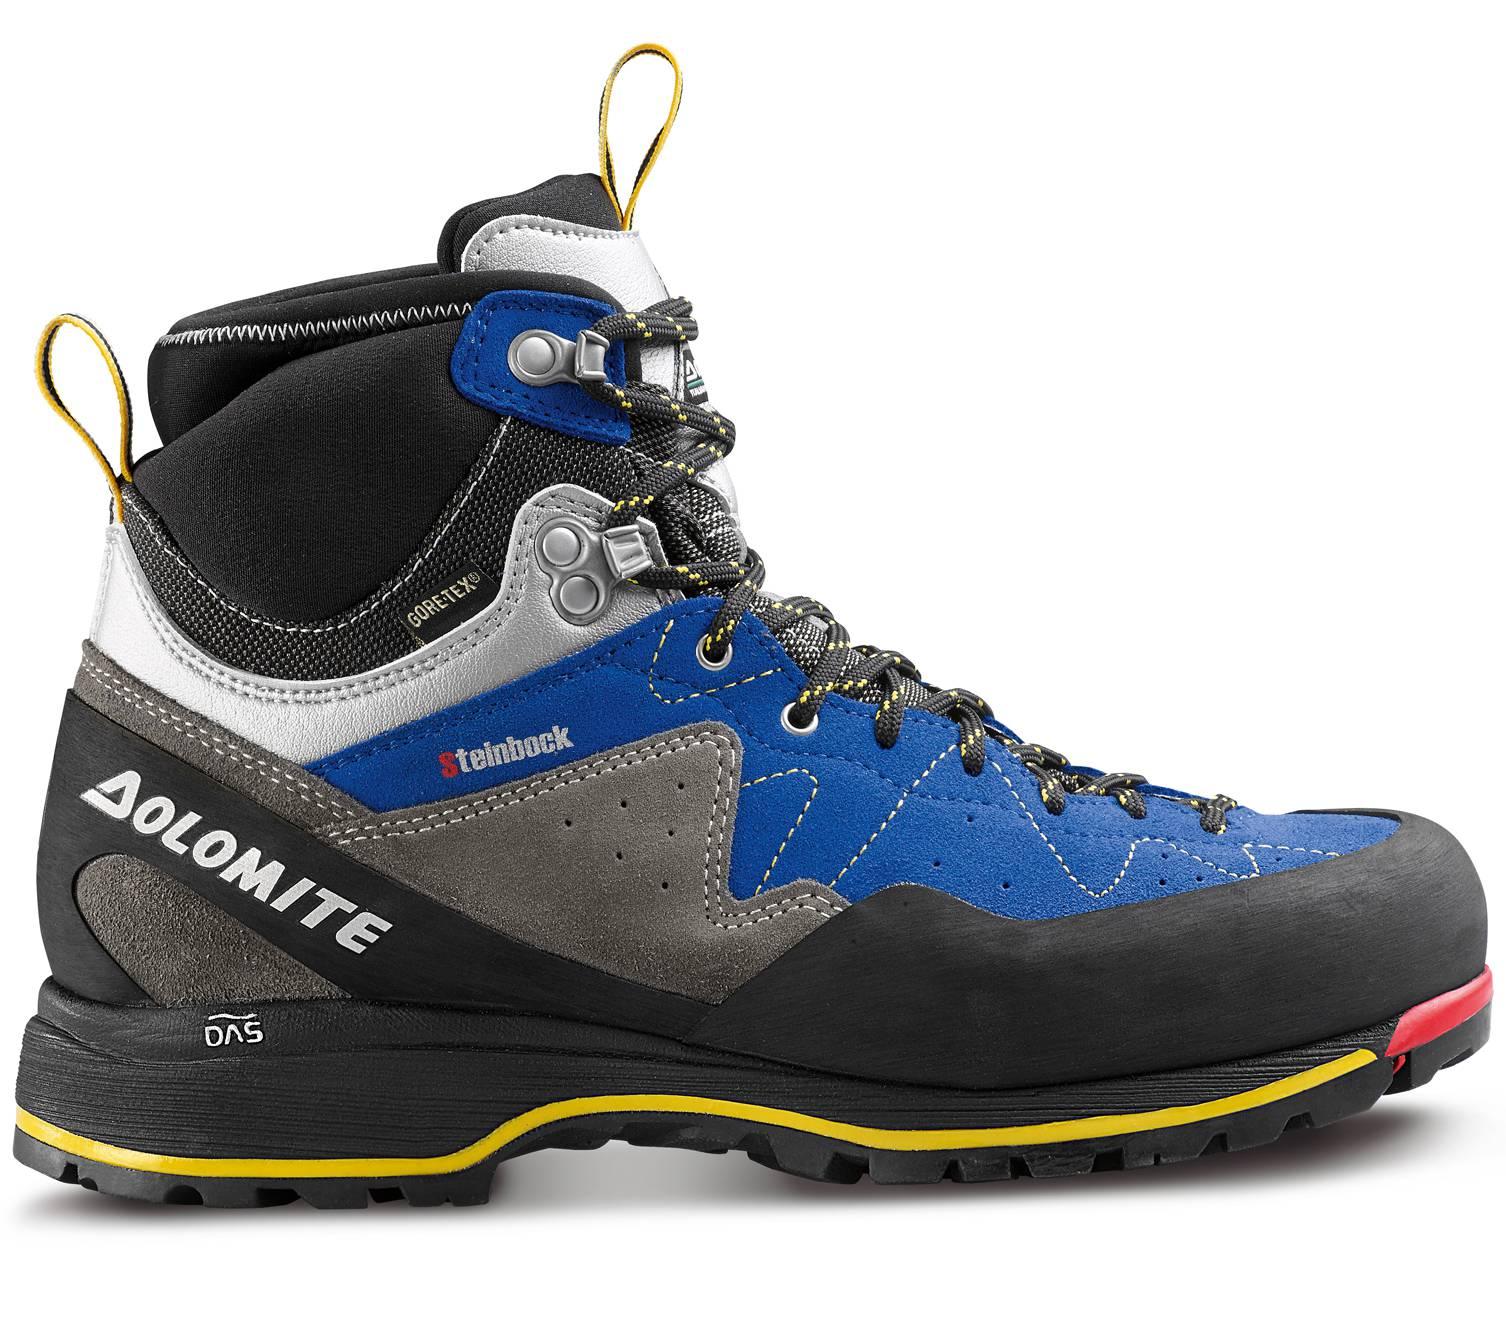 Dolomite Steinbock Approach HP GTX Uomo Scarponi Trekking Scarponcino Montagna